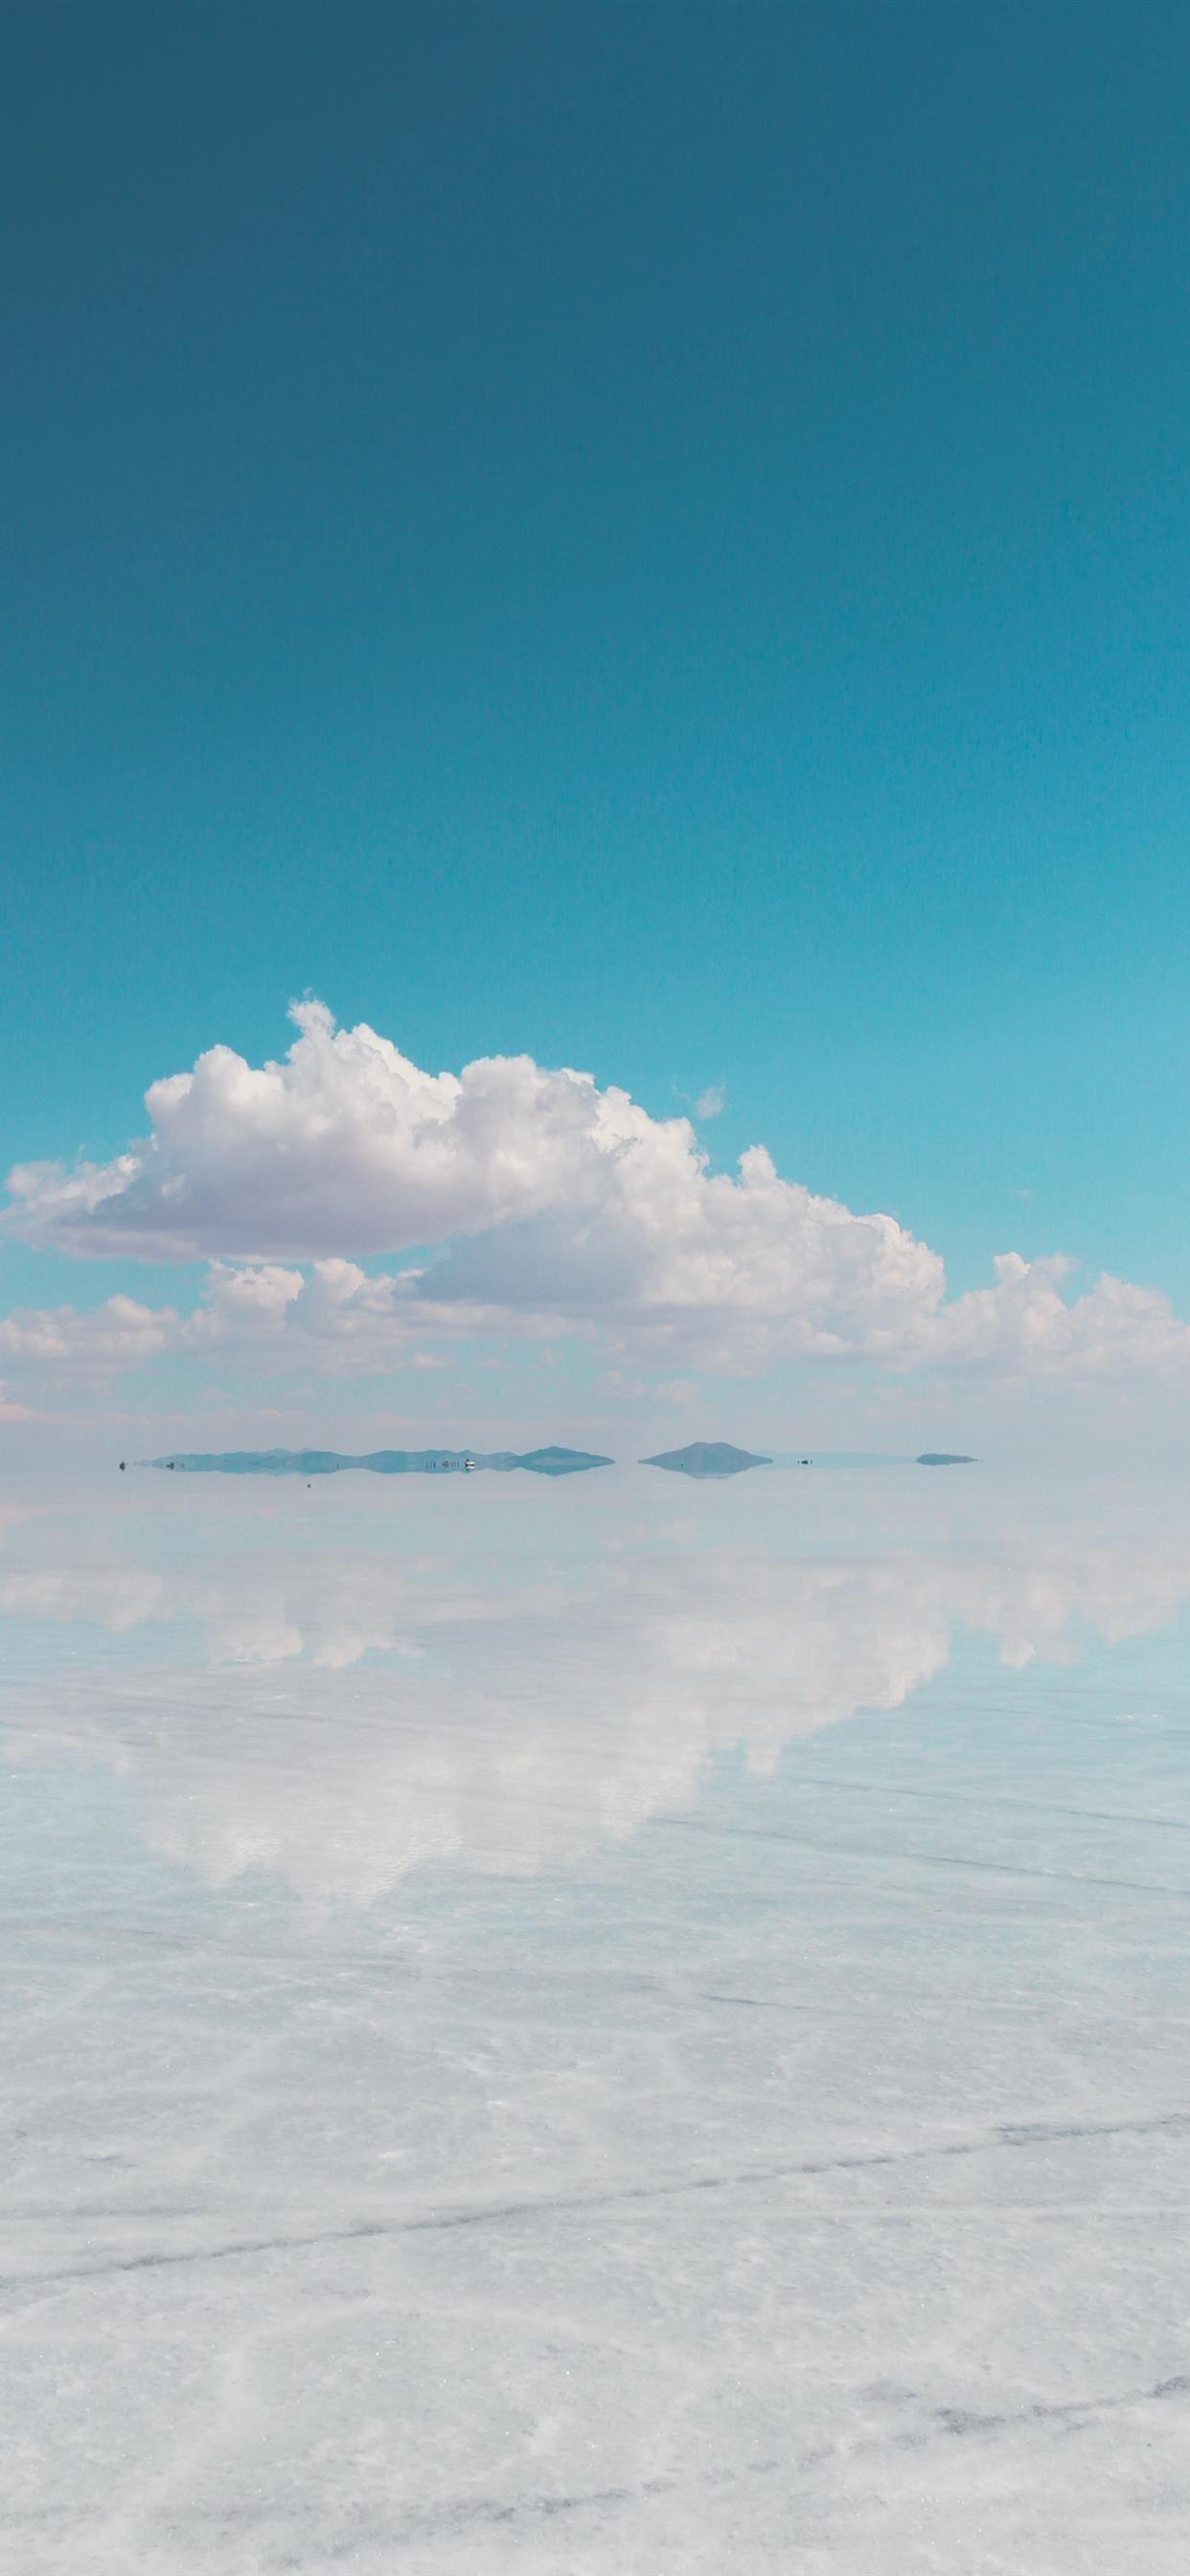 Uyuni Salt Flat Bolivia Iphone Wallpapers Free Download